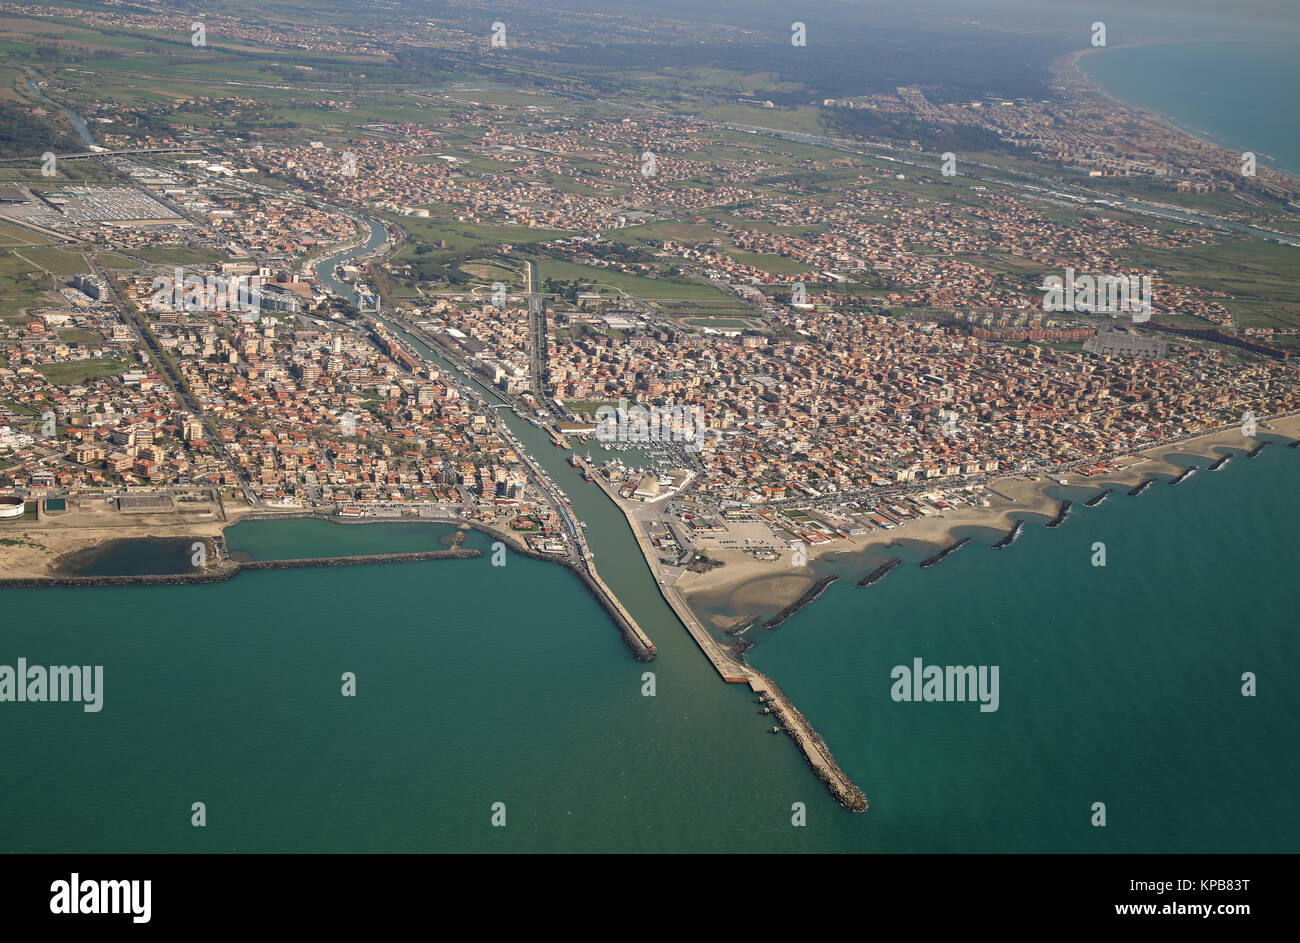 aerial view of the Tyrrhenian coastline and Fiumicino town, near Roma, Lazio, Italy - Stock Image